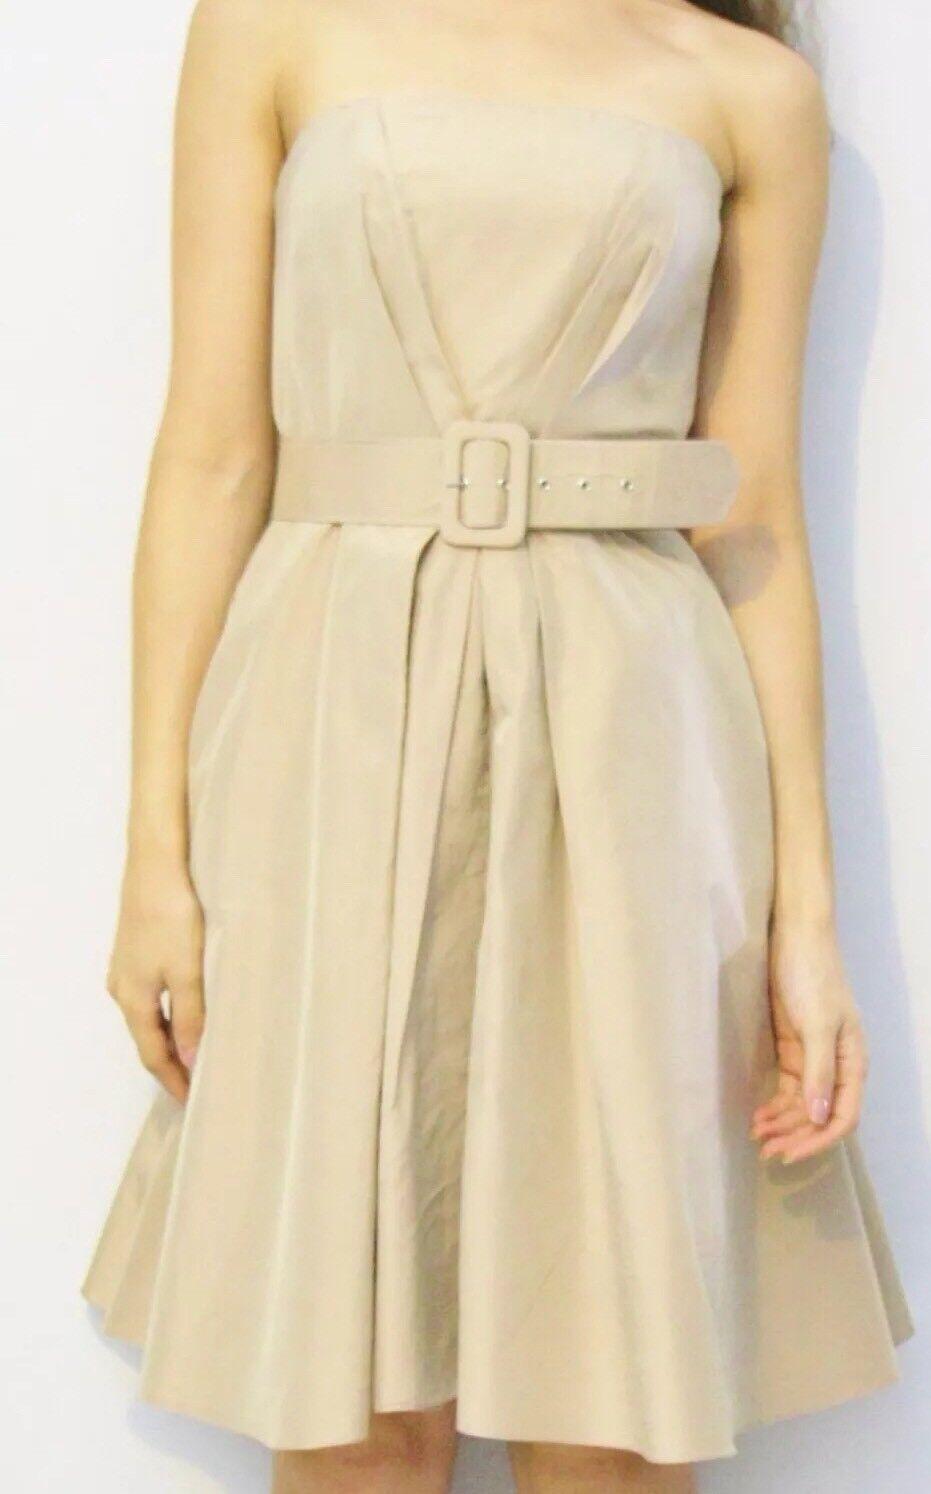 savingglory JAYSON BRUNSDON Cocktail Dress Silk Formal Hepburn AU 8 Eu 36 US 4